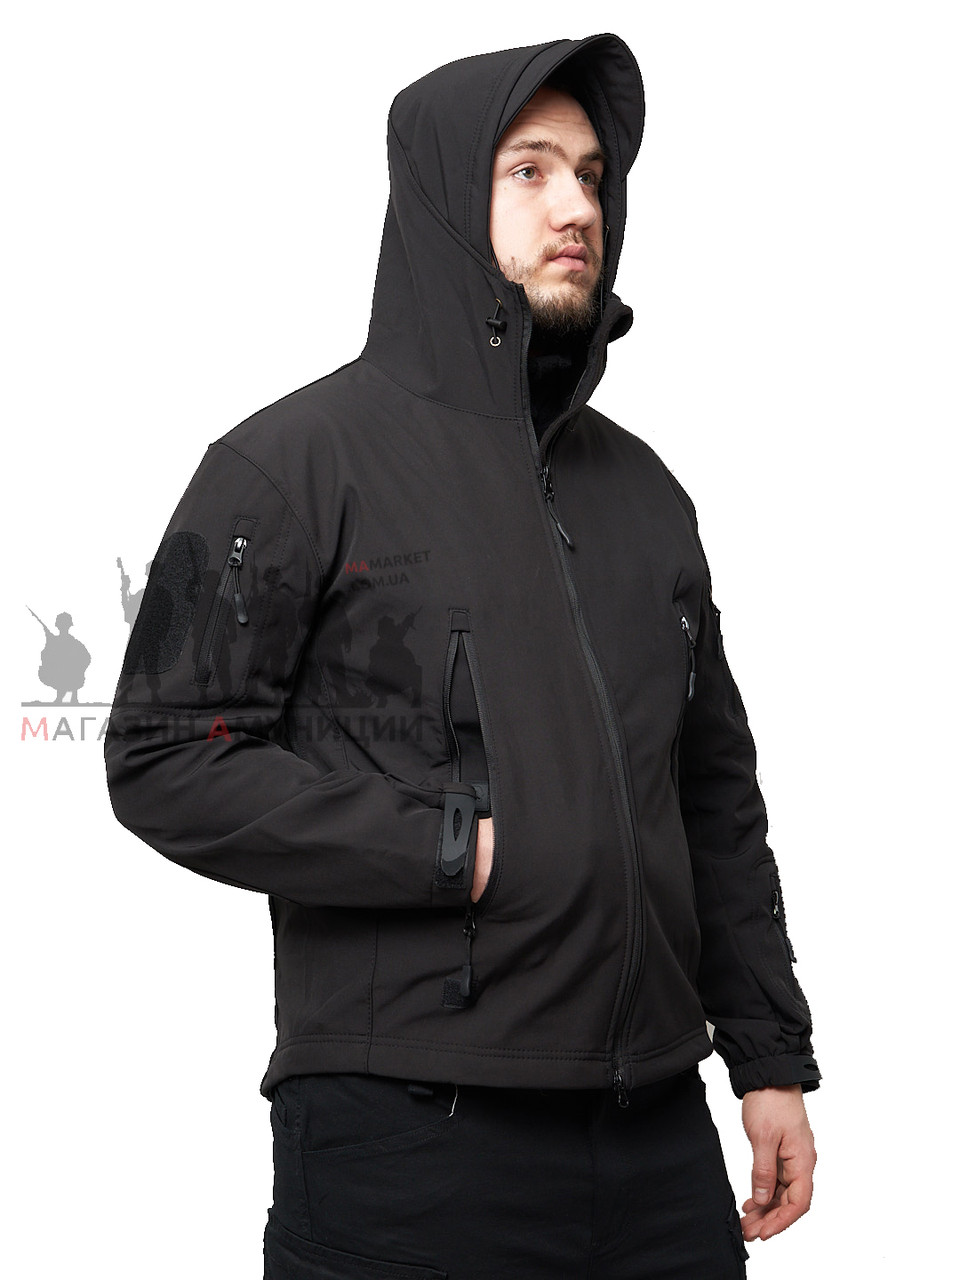 Куртка тактична Softshell Shark Skin 01. ESDY. Чорна L